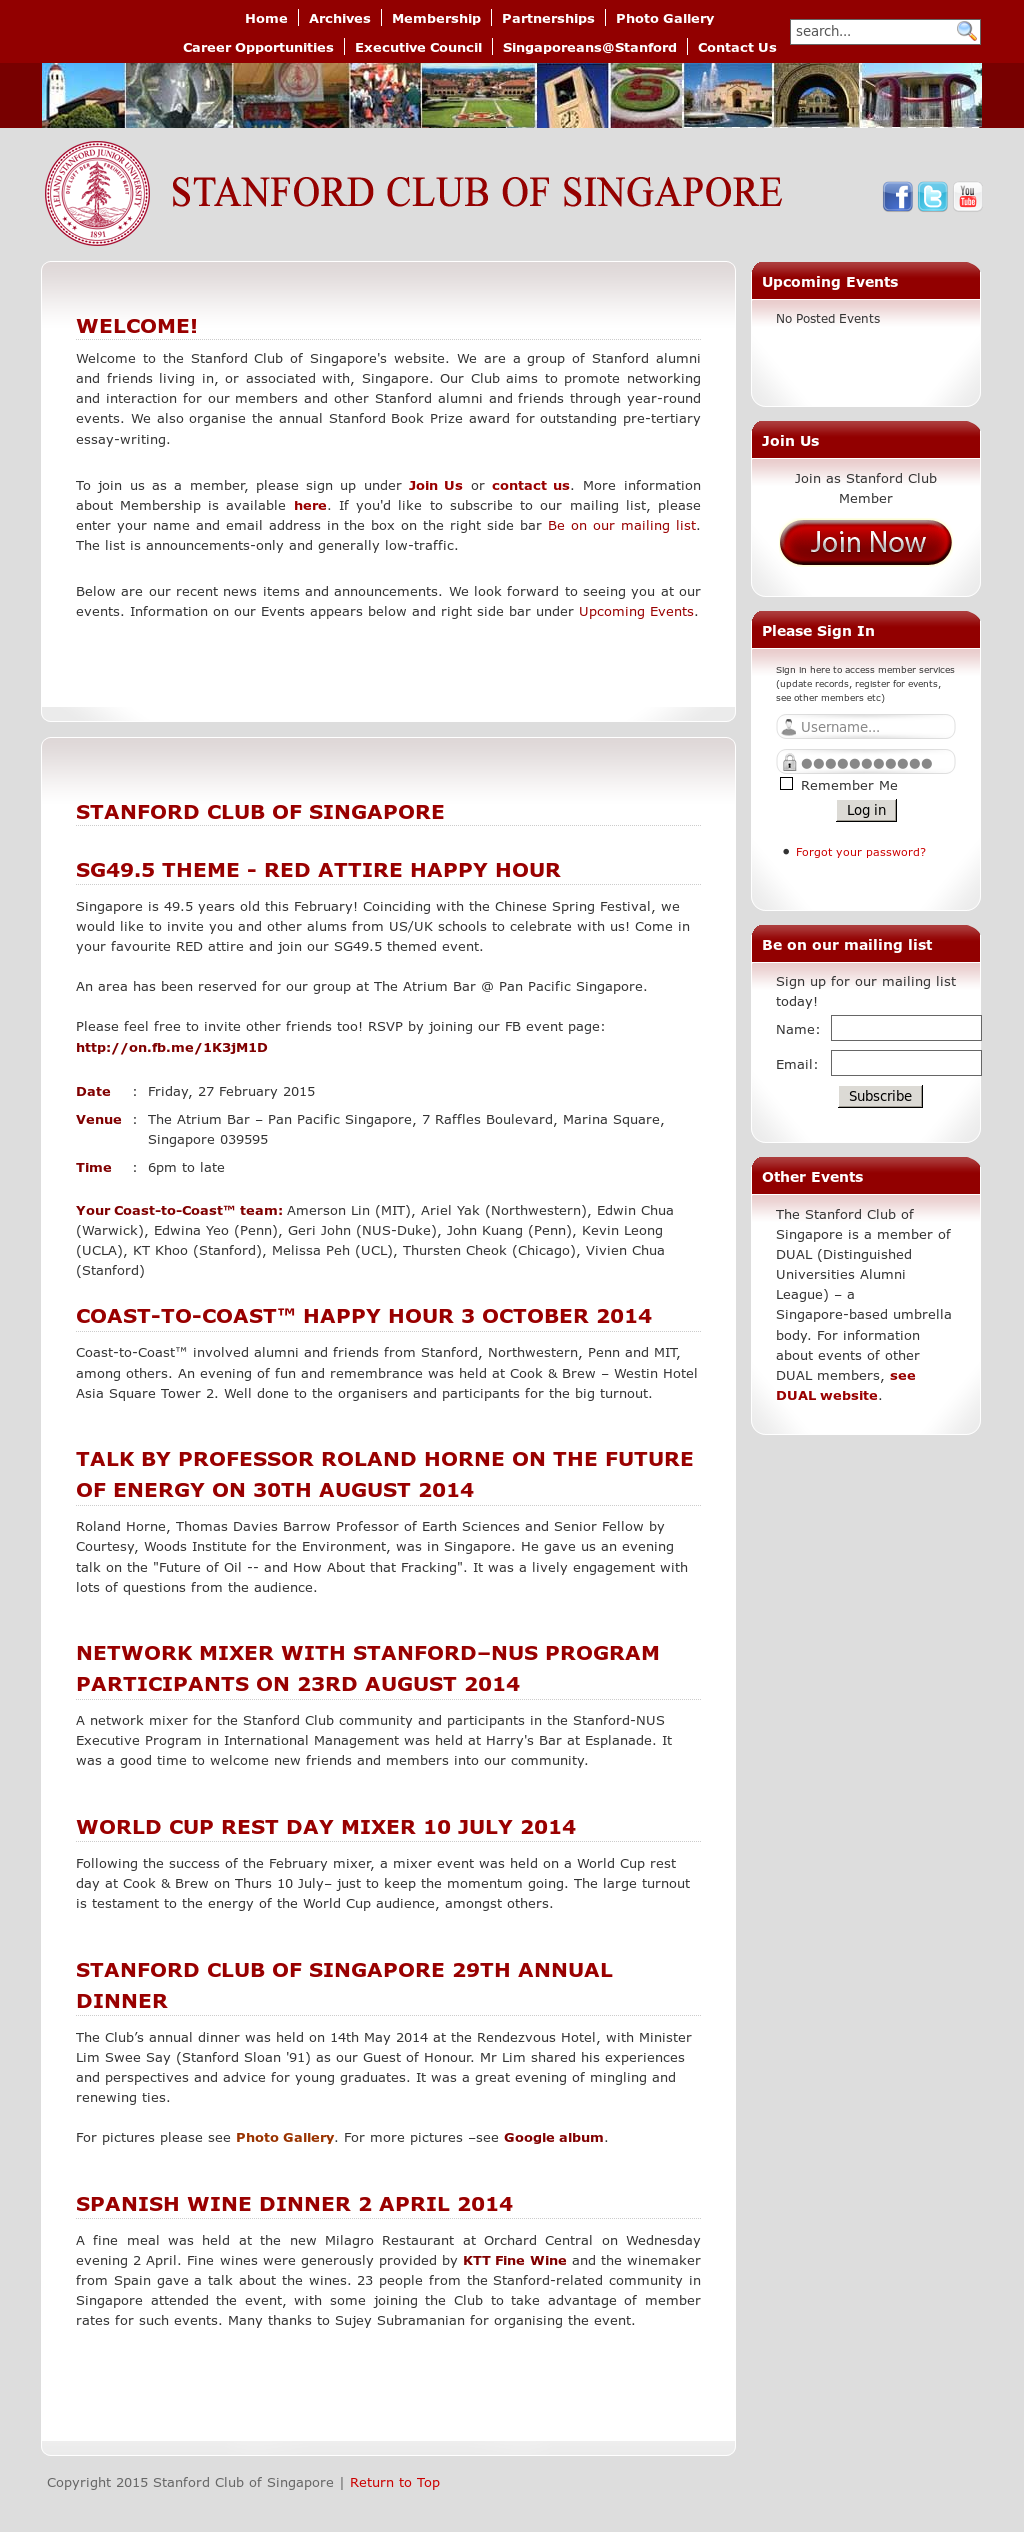 Stanford alumni dating Millionaires Club dating Verenigd Koninkrijk